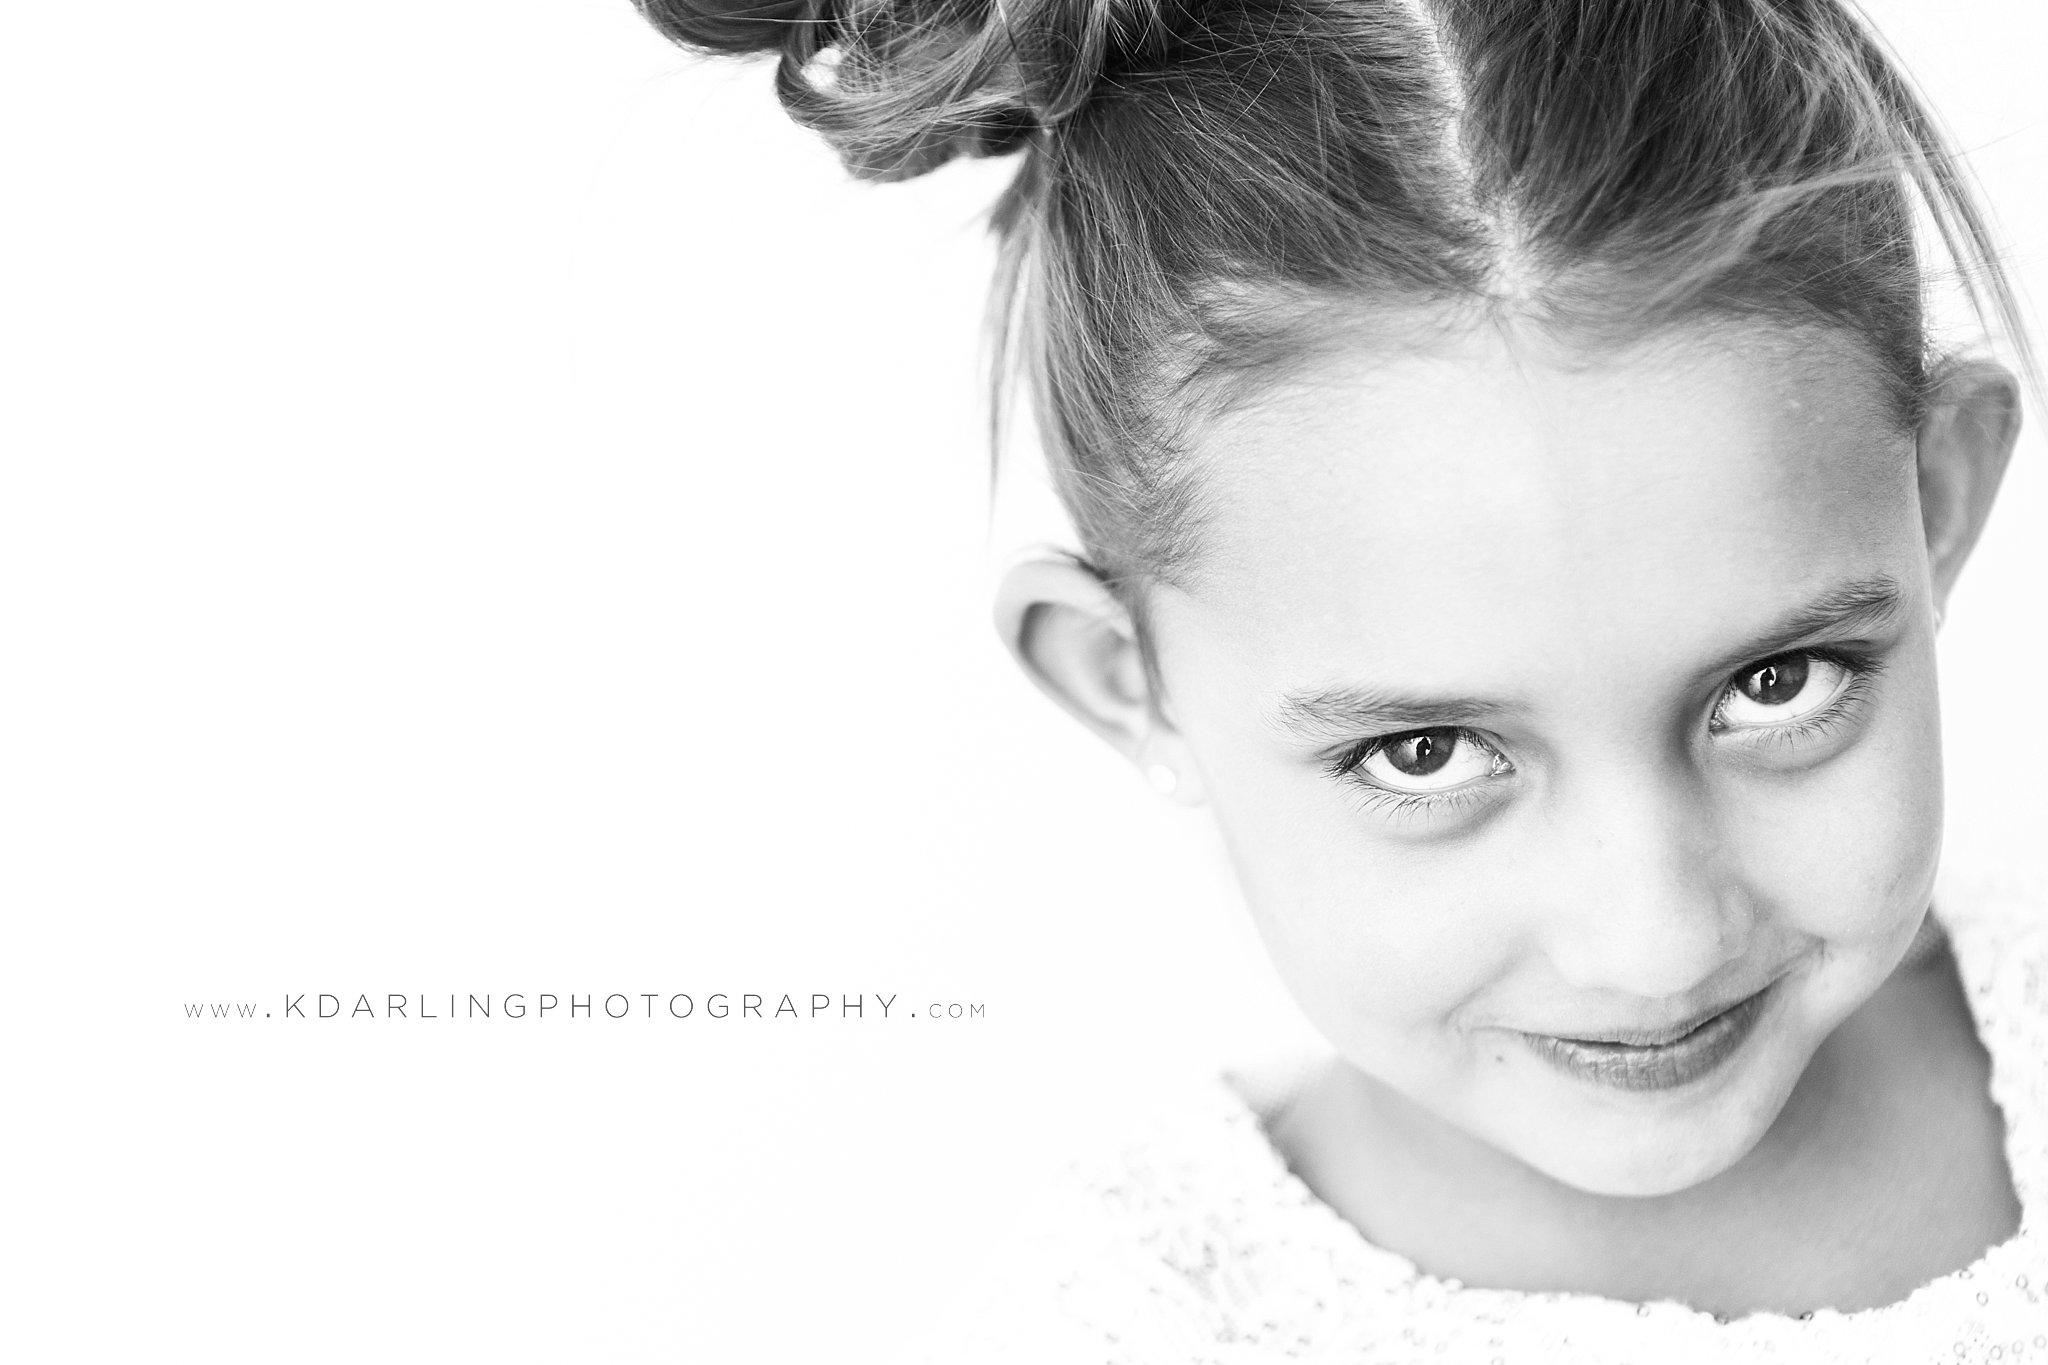 Child-Photographer-portraits-Champaign-County-IL-Fisher-Studio-Darling_0183.jpg